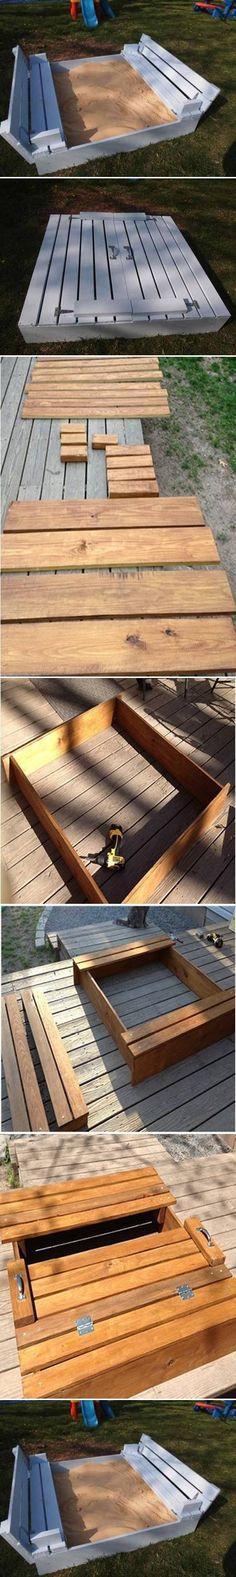 Sandkiste aus alten Paletten - DIY - 30 Amazing Uses For Old Pallets Pallet Crafts, Pallet Projects, Home Projects, Wood Crafts, Projects To Try, Diy Crafts, Diy Pallet, Pallet Ideas, Diy Projects For Men